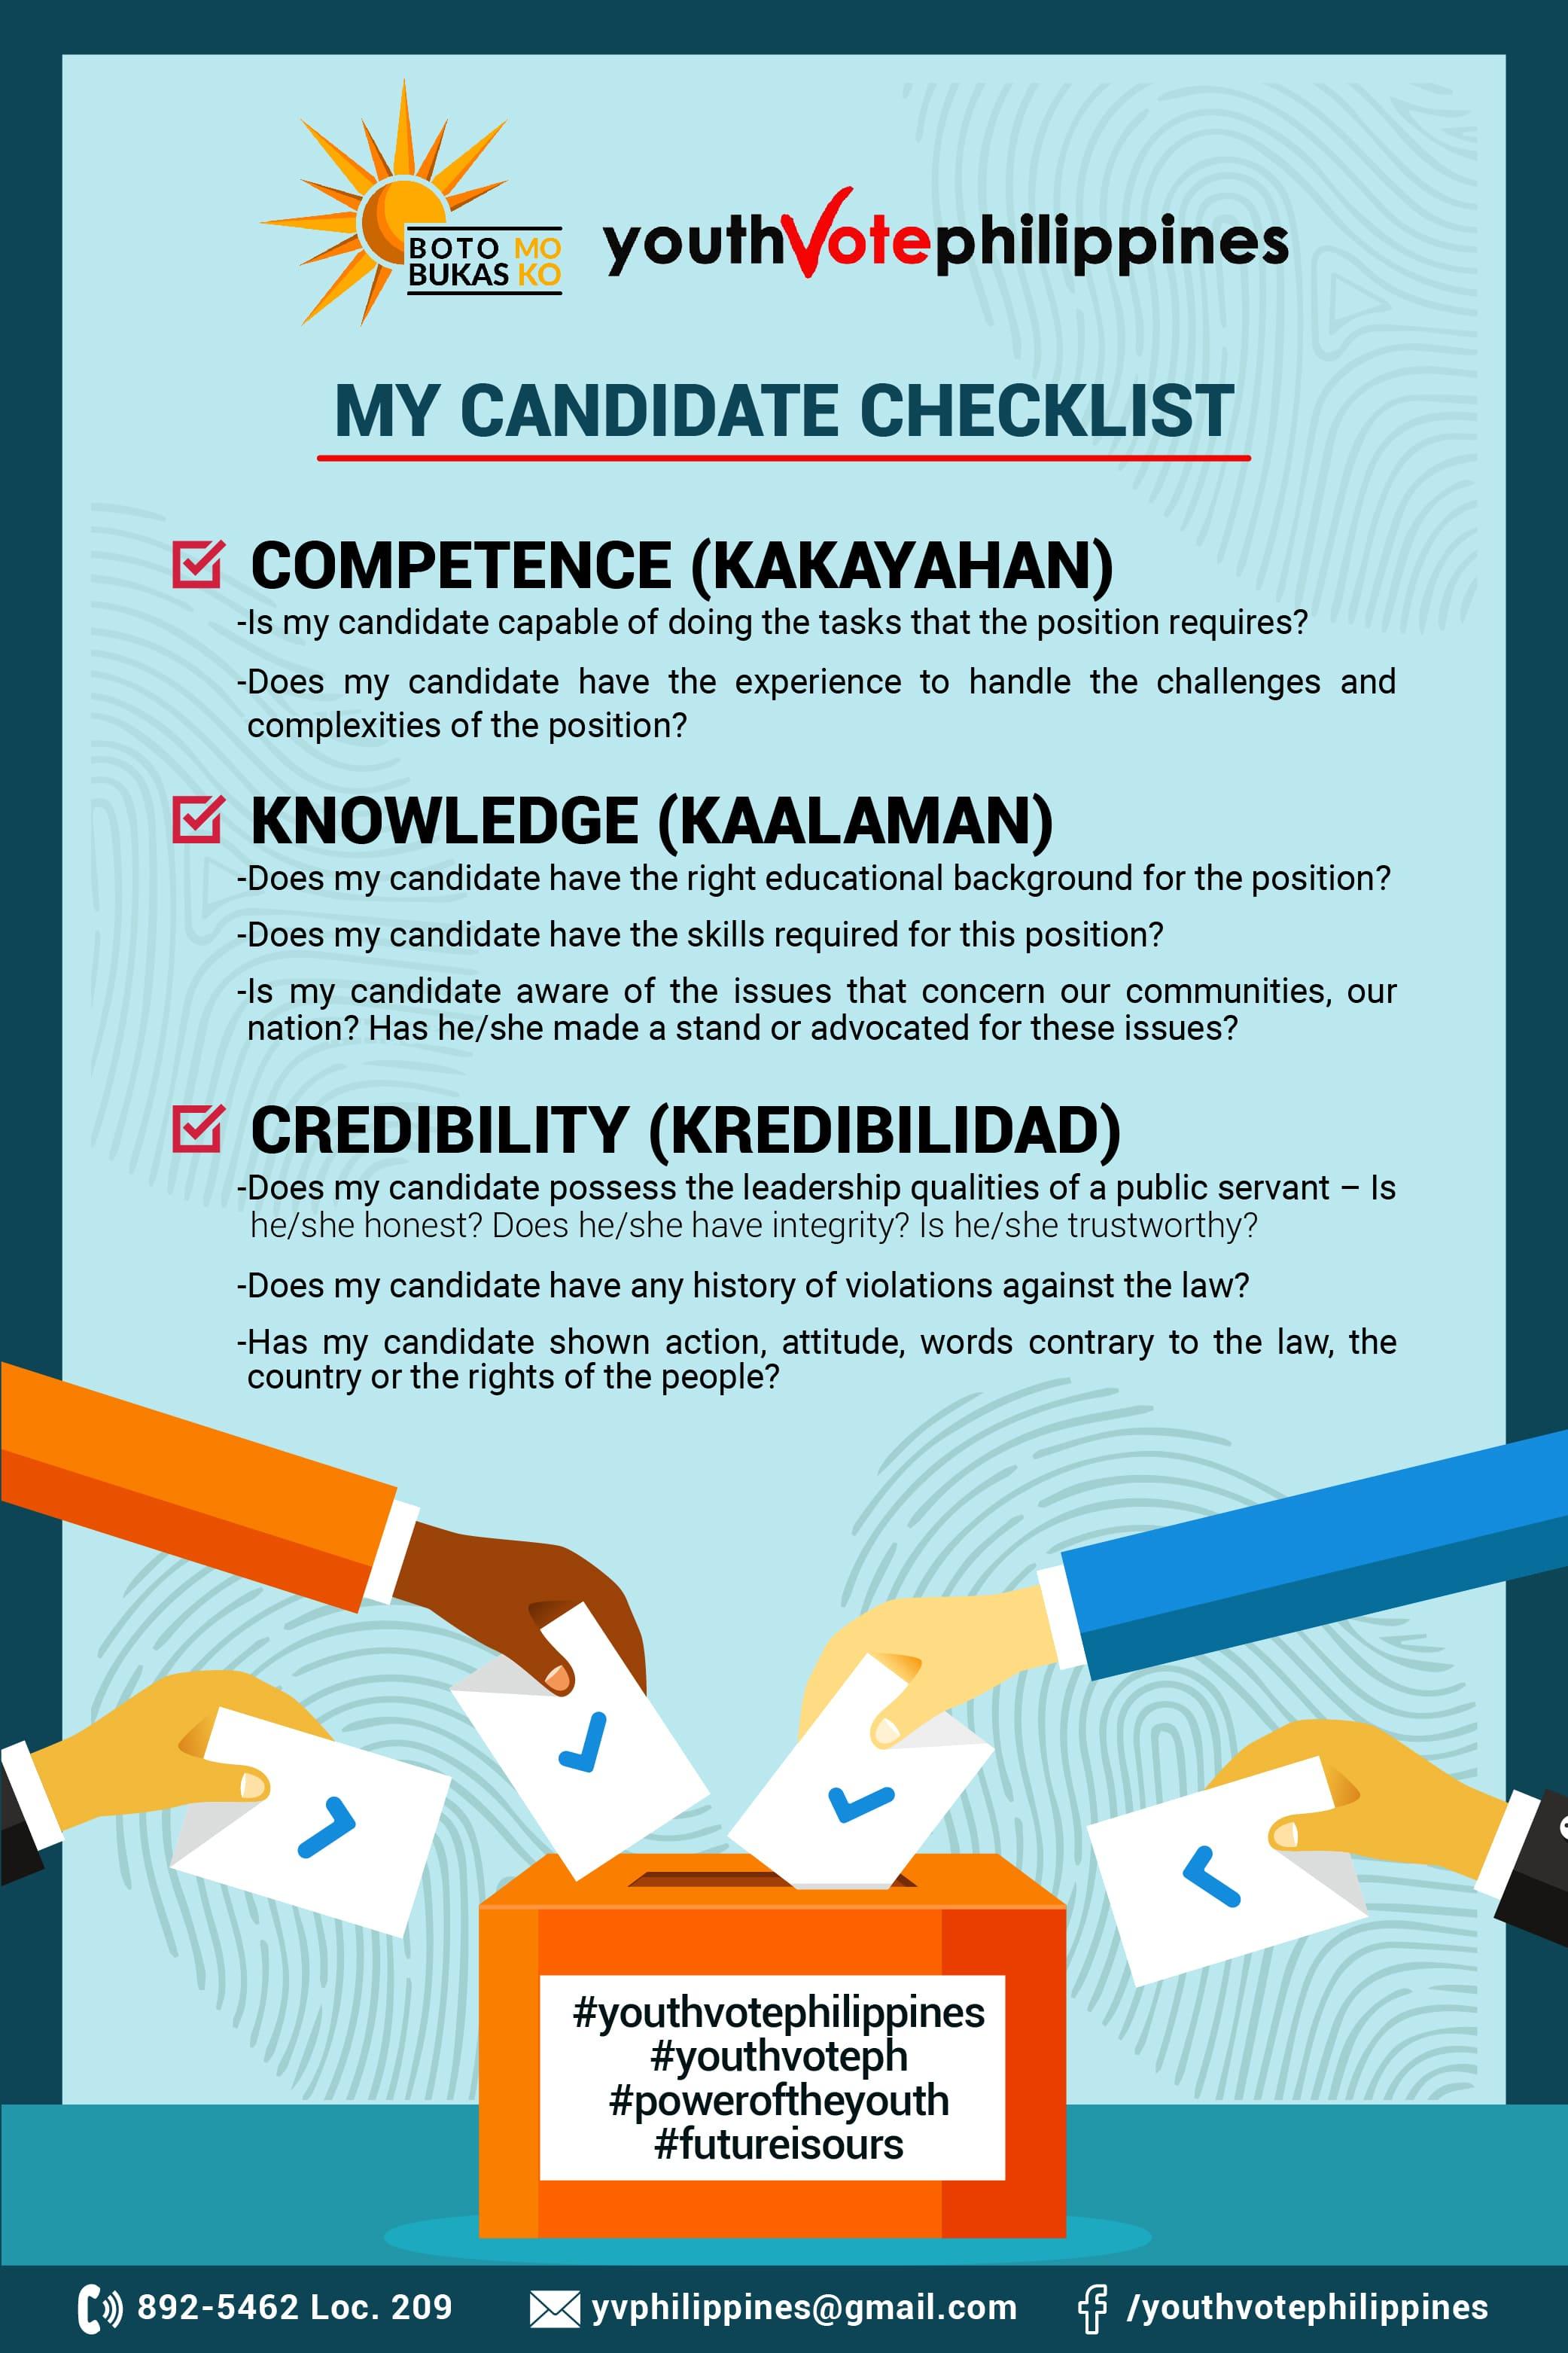 My Candidate Checklist: Competent (Kakayahan). Knowledge (Kaalaman). Credibility (Kredibilidad).